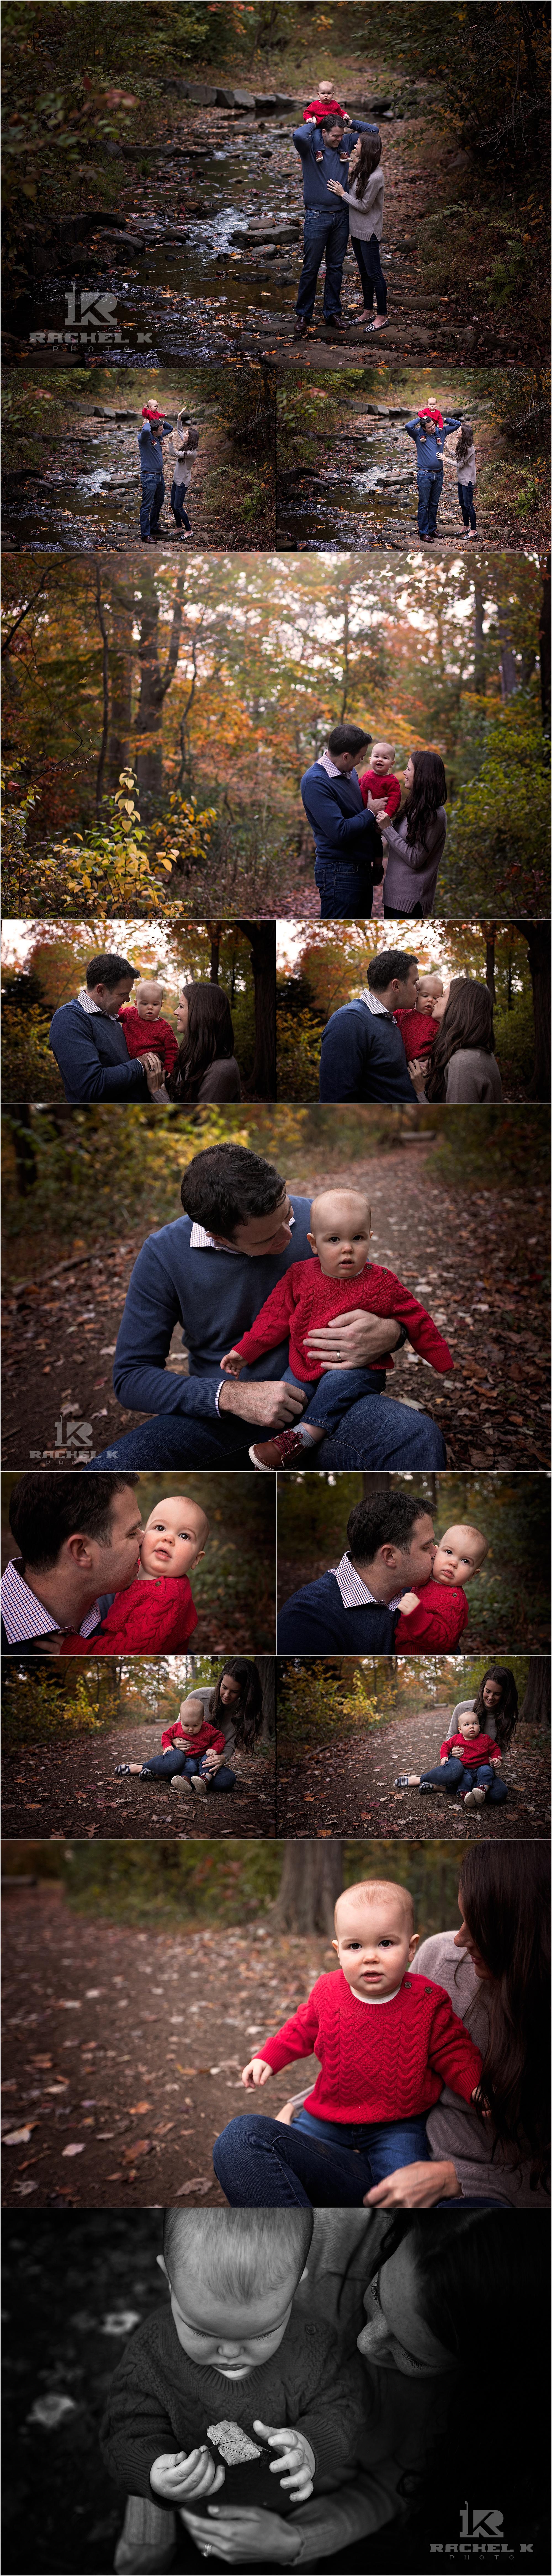 Fall family session with baby by Fairfax Virginia family photographer Rachel K Photo